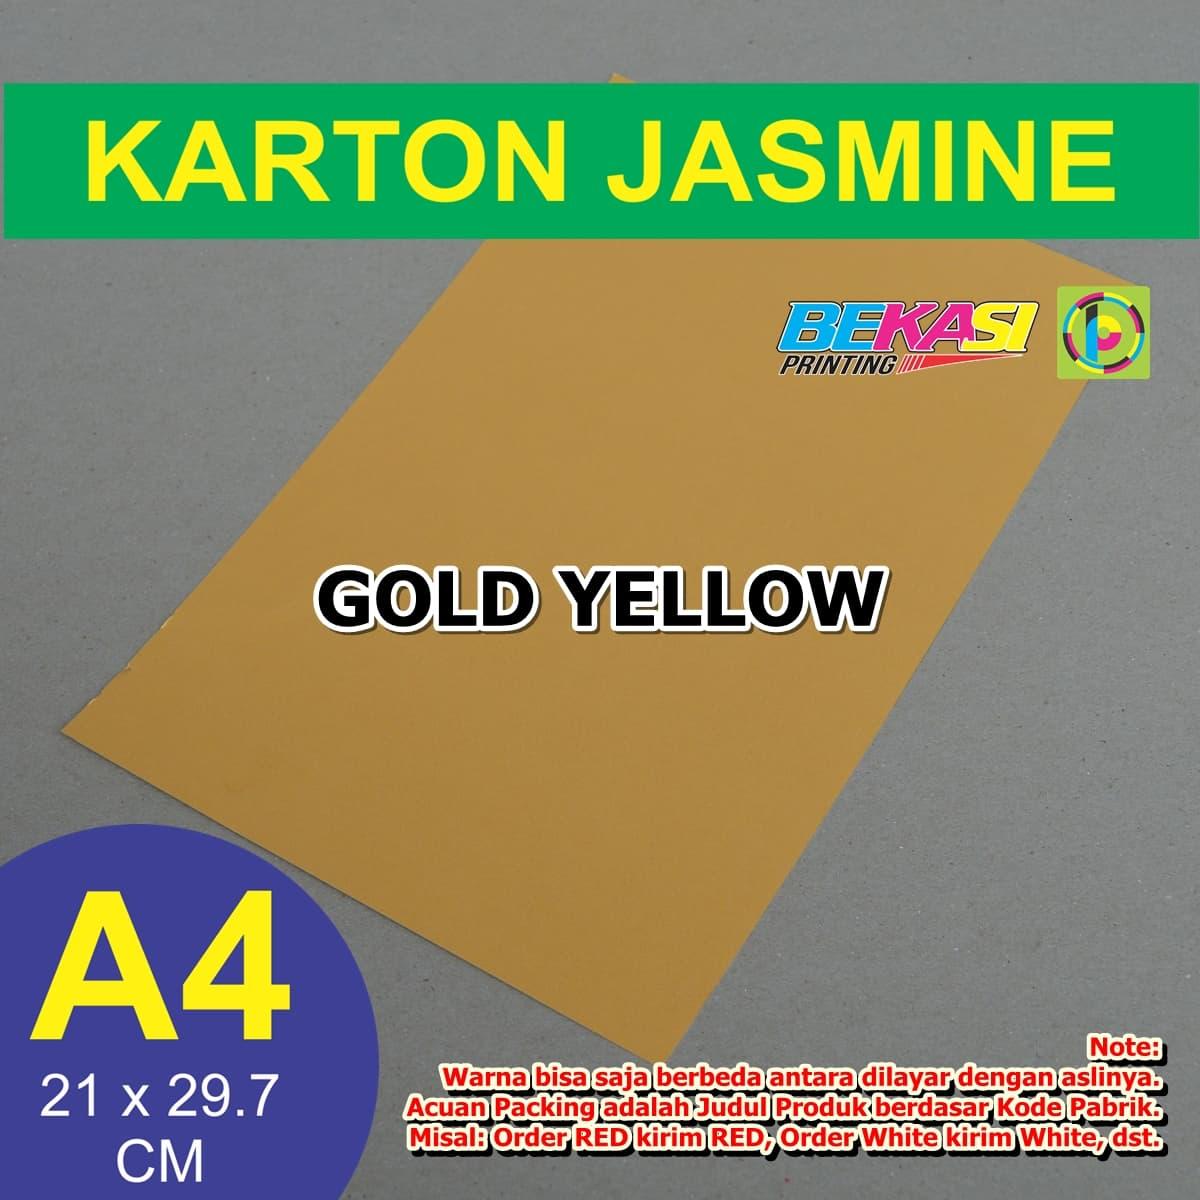 Jual Kertas Karton Jasmine Paper Flower A4 Gold Yellow Kuning Emas Umahkertas Undangan Pernikahan Bekasi Printing Tokopedia